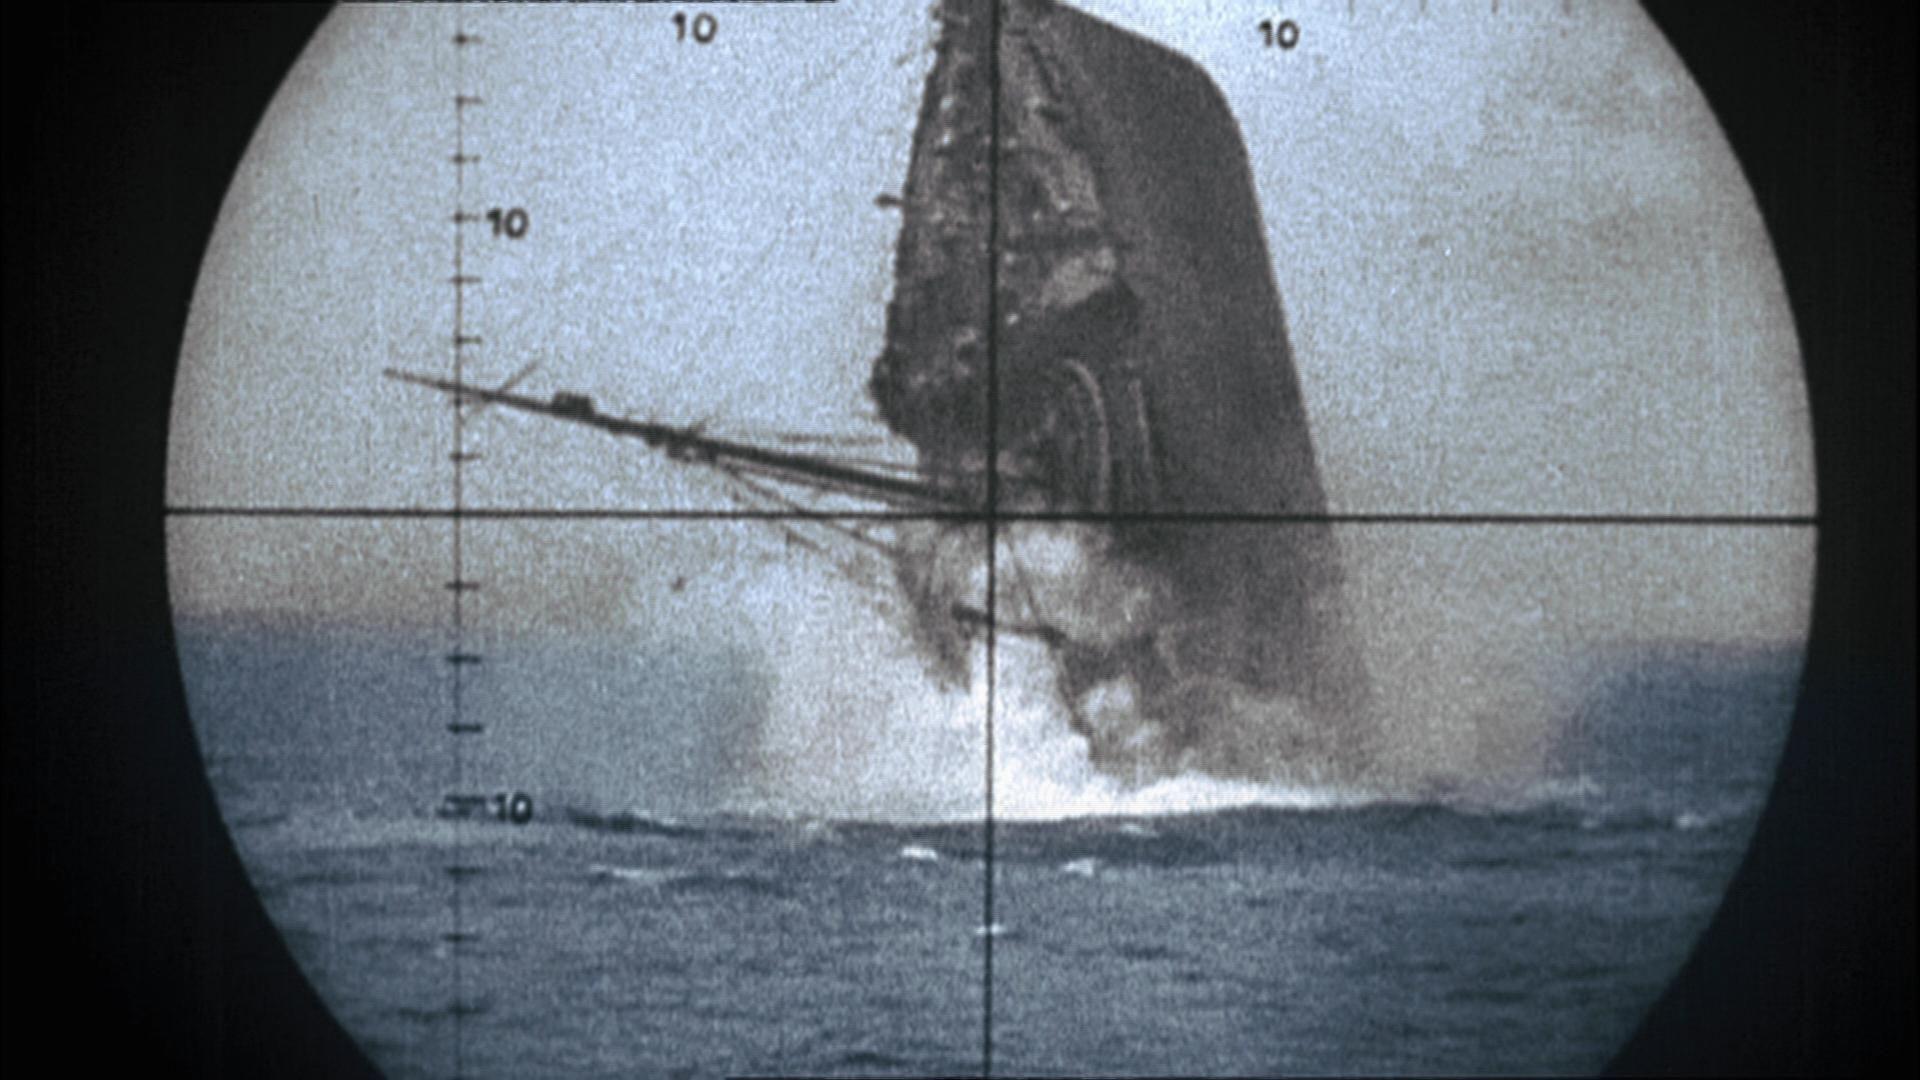 u-boats ~ allied vessel sinking, seen through periscope of a